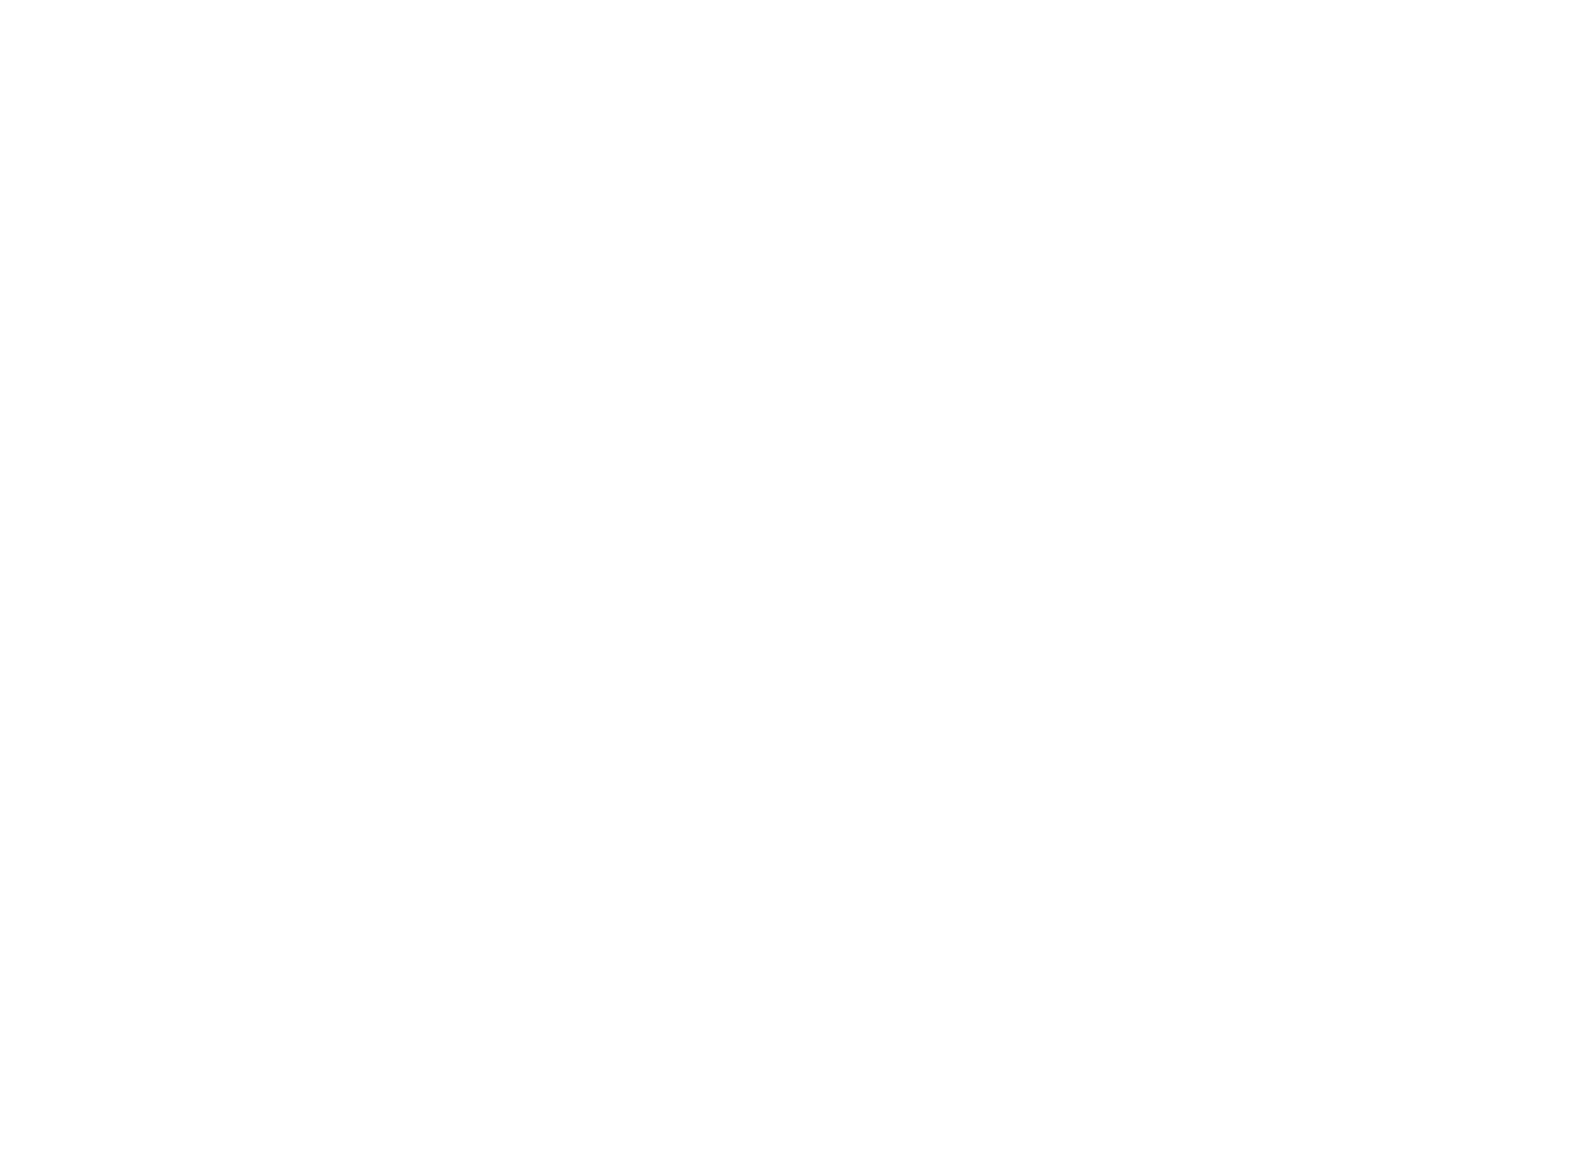 Zero Two video production company, Washington video marketing